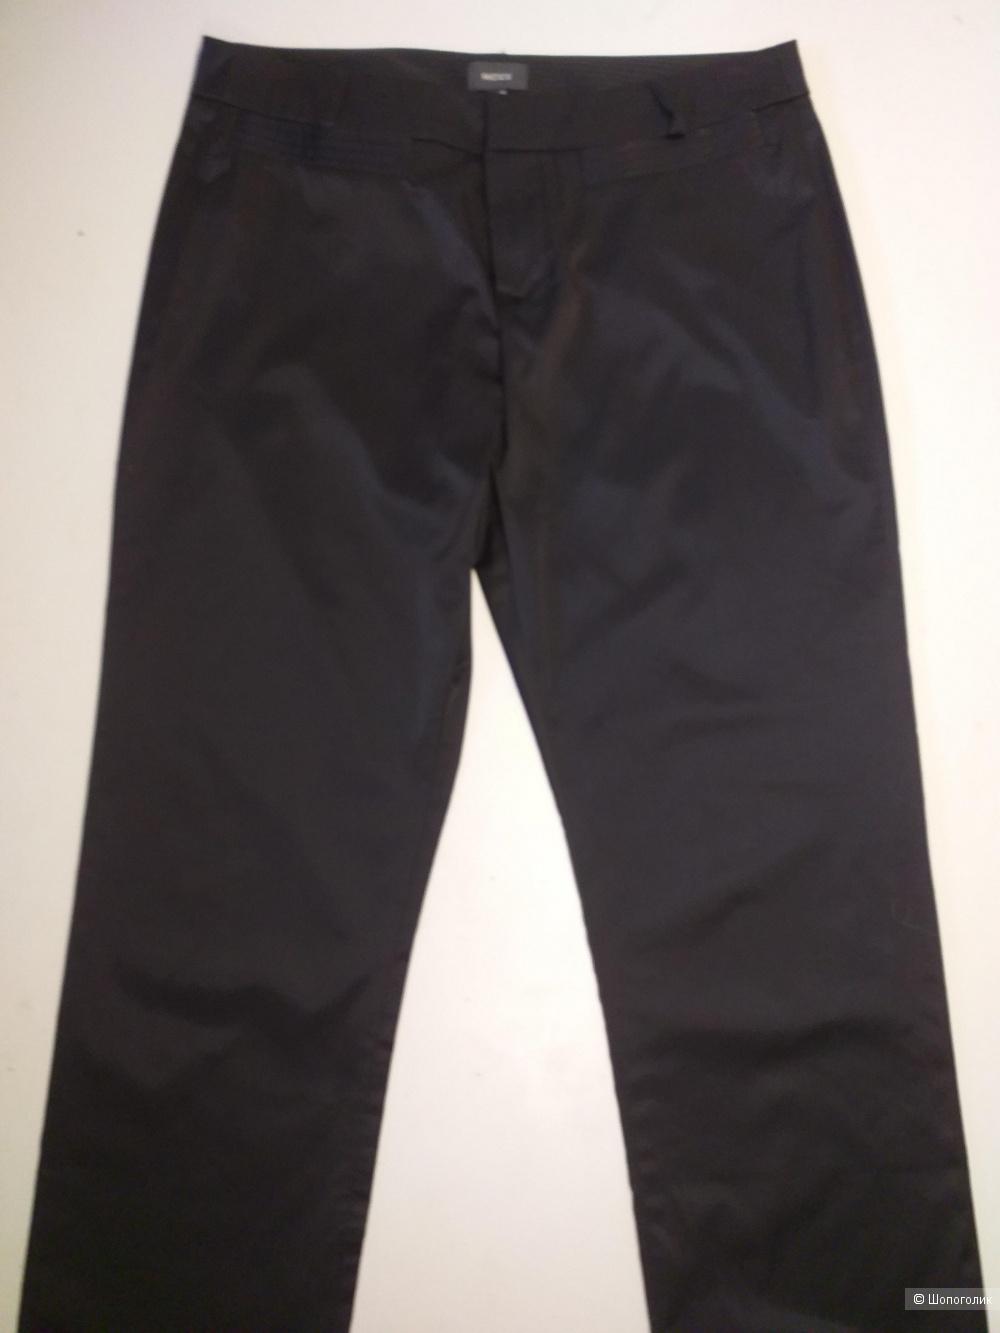 Сет - брюки Mexx и блузка Lucy&Co р.44